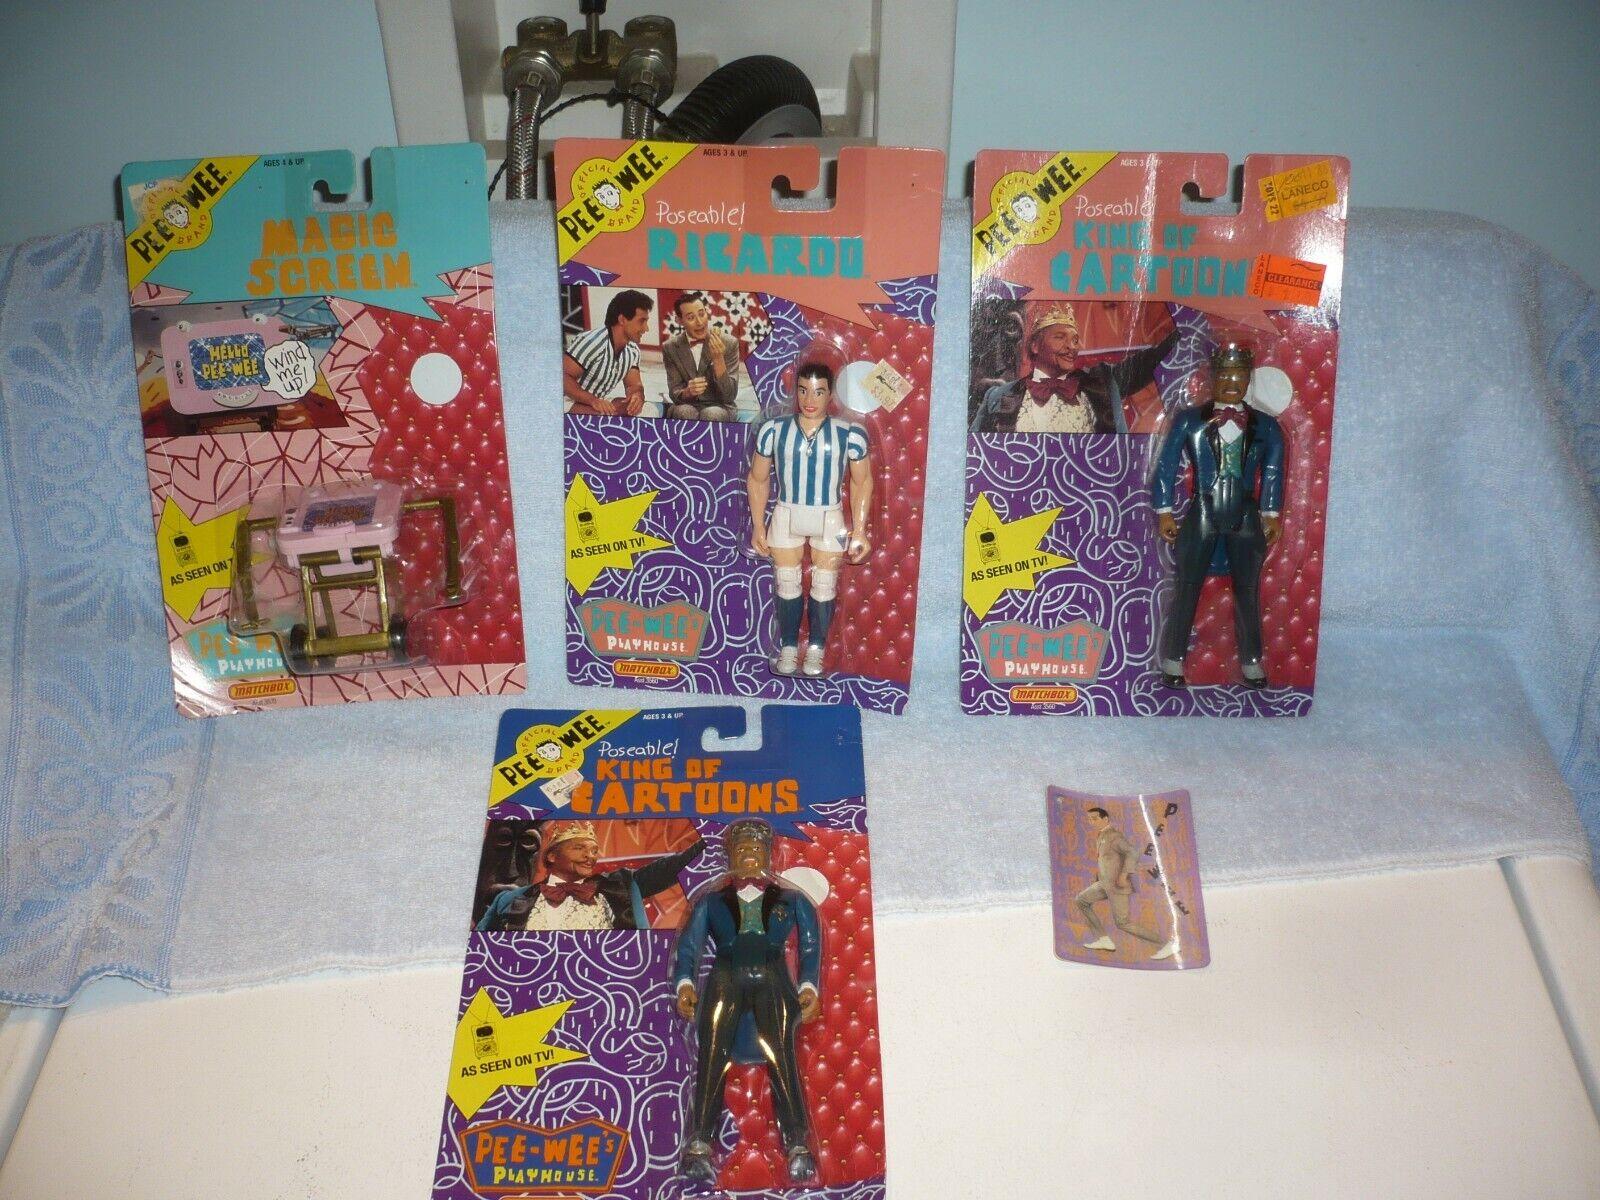 1988 Matchbox Pee Wee Herman King Of Cartoons Figures ricardo magic screen fre